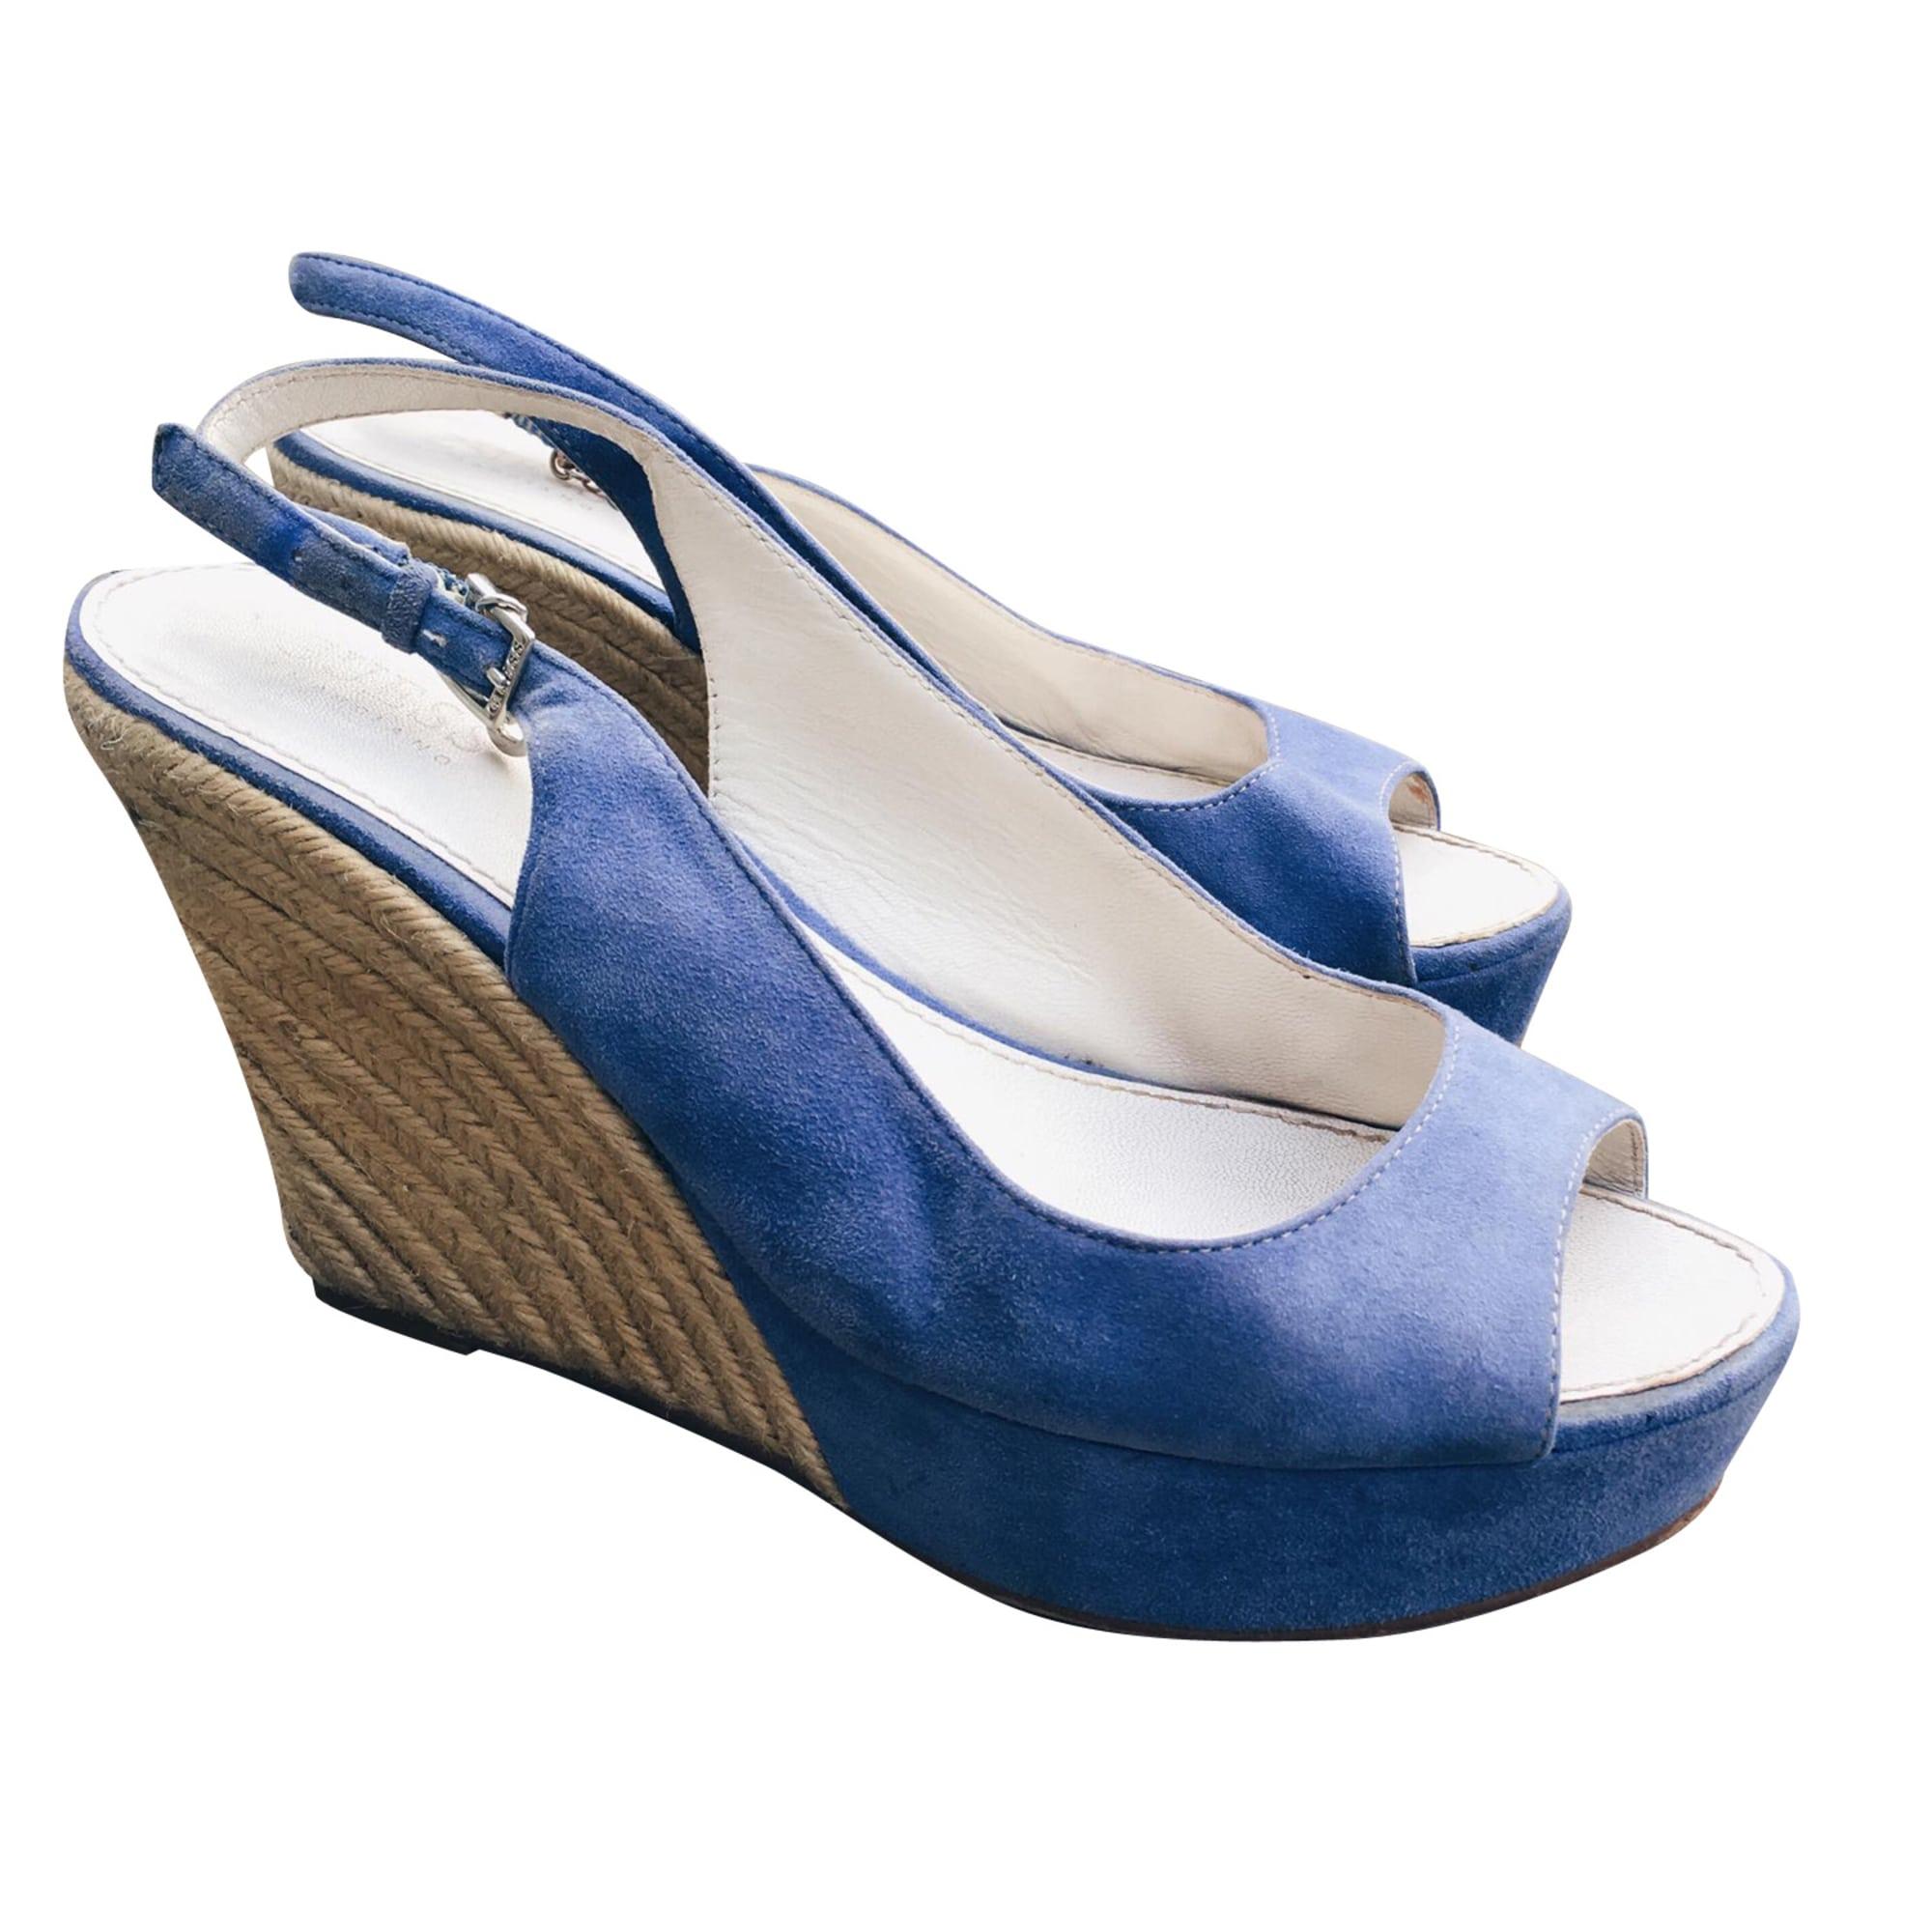 Sandales compensées GUESS Bleu, bleu marine, bleu turquoise